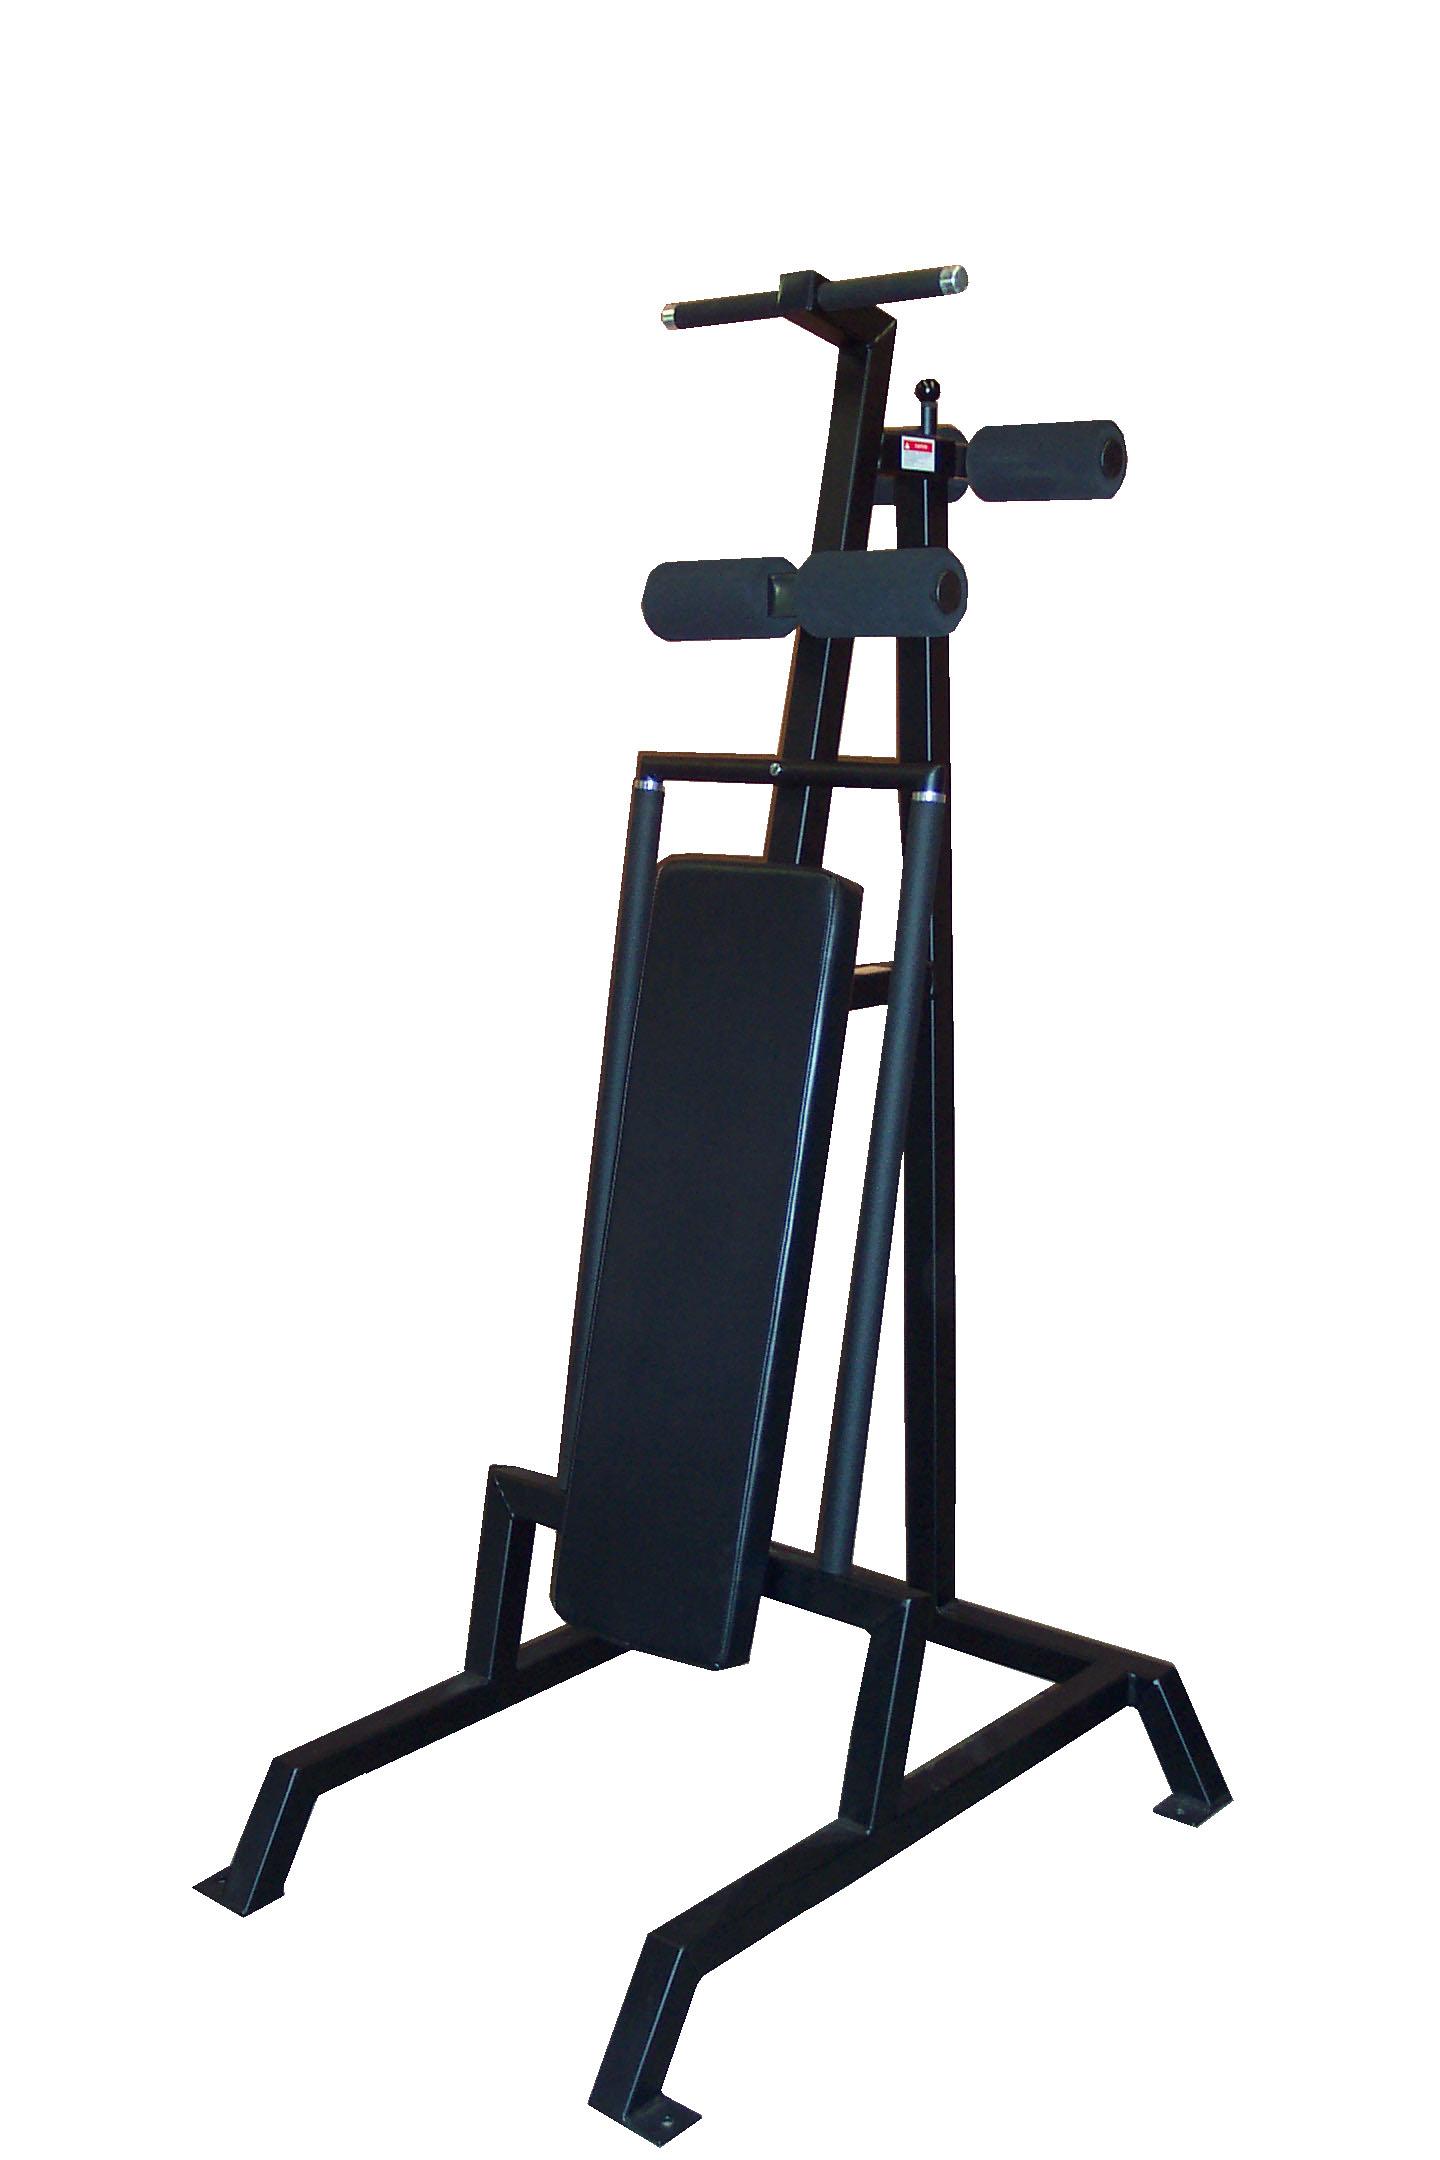 MAX#CGAB2 Abdominal Bench